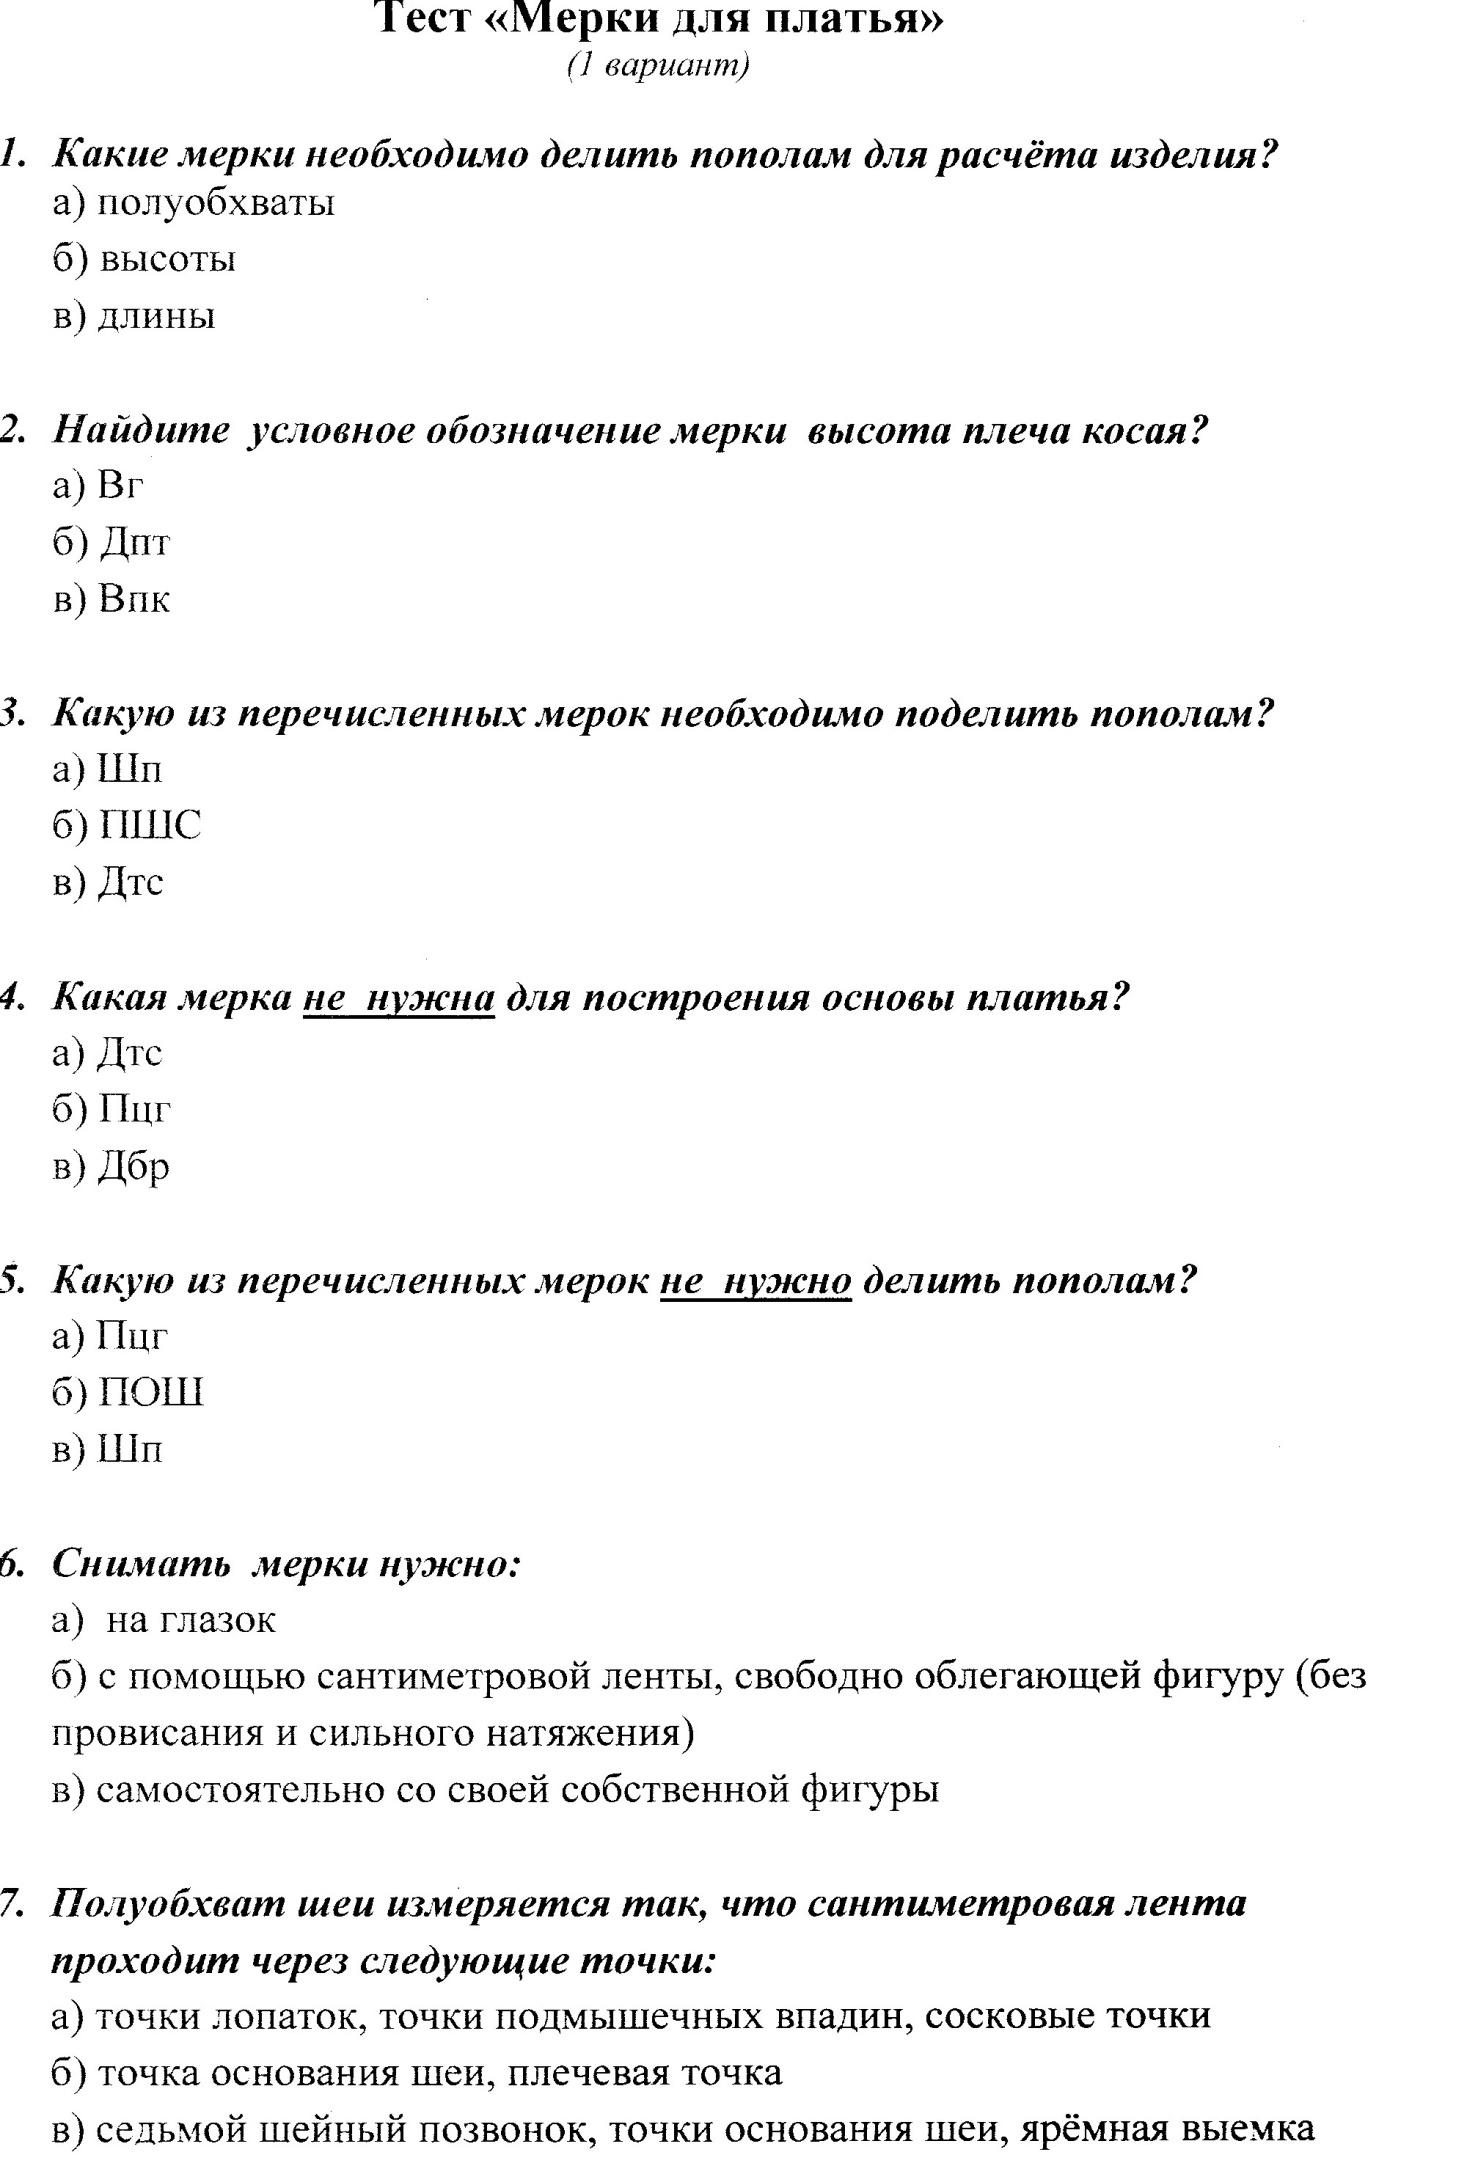 C:\Documents and Settings\Пользователь\Мои документы\Мои рисунки\img373.jpg